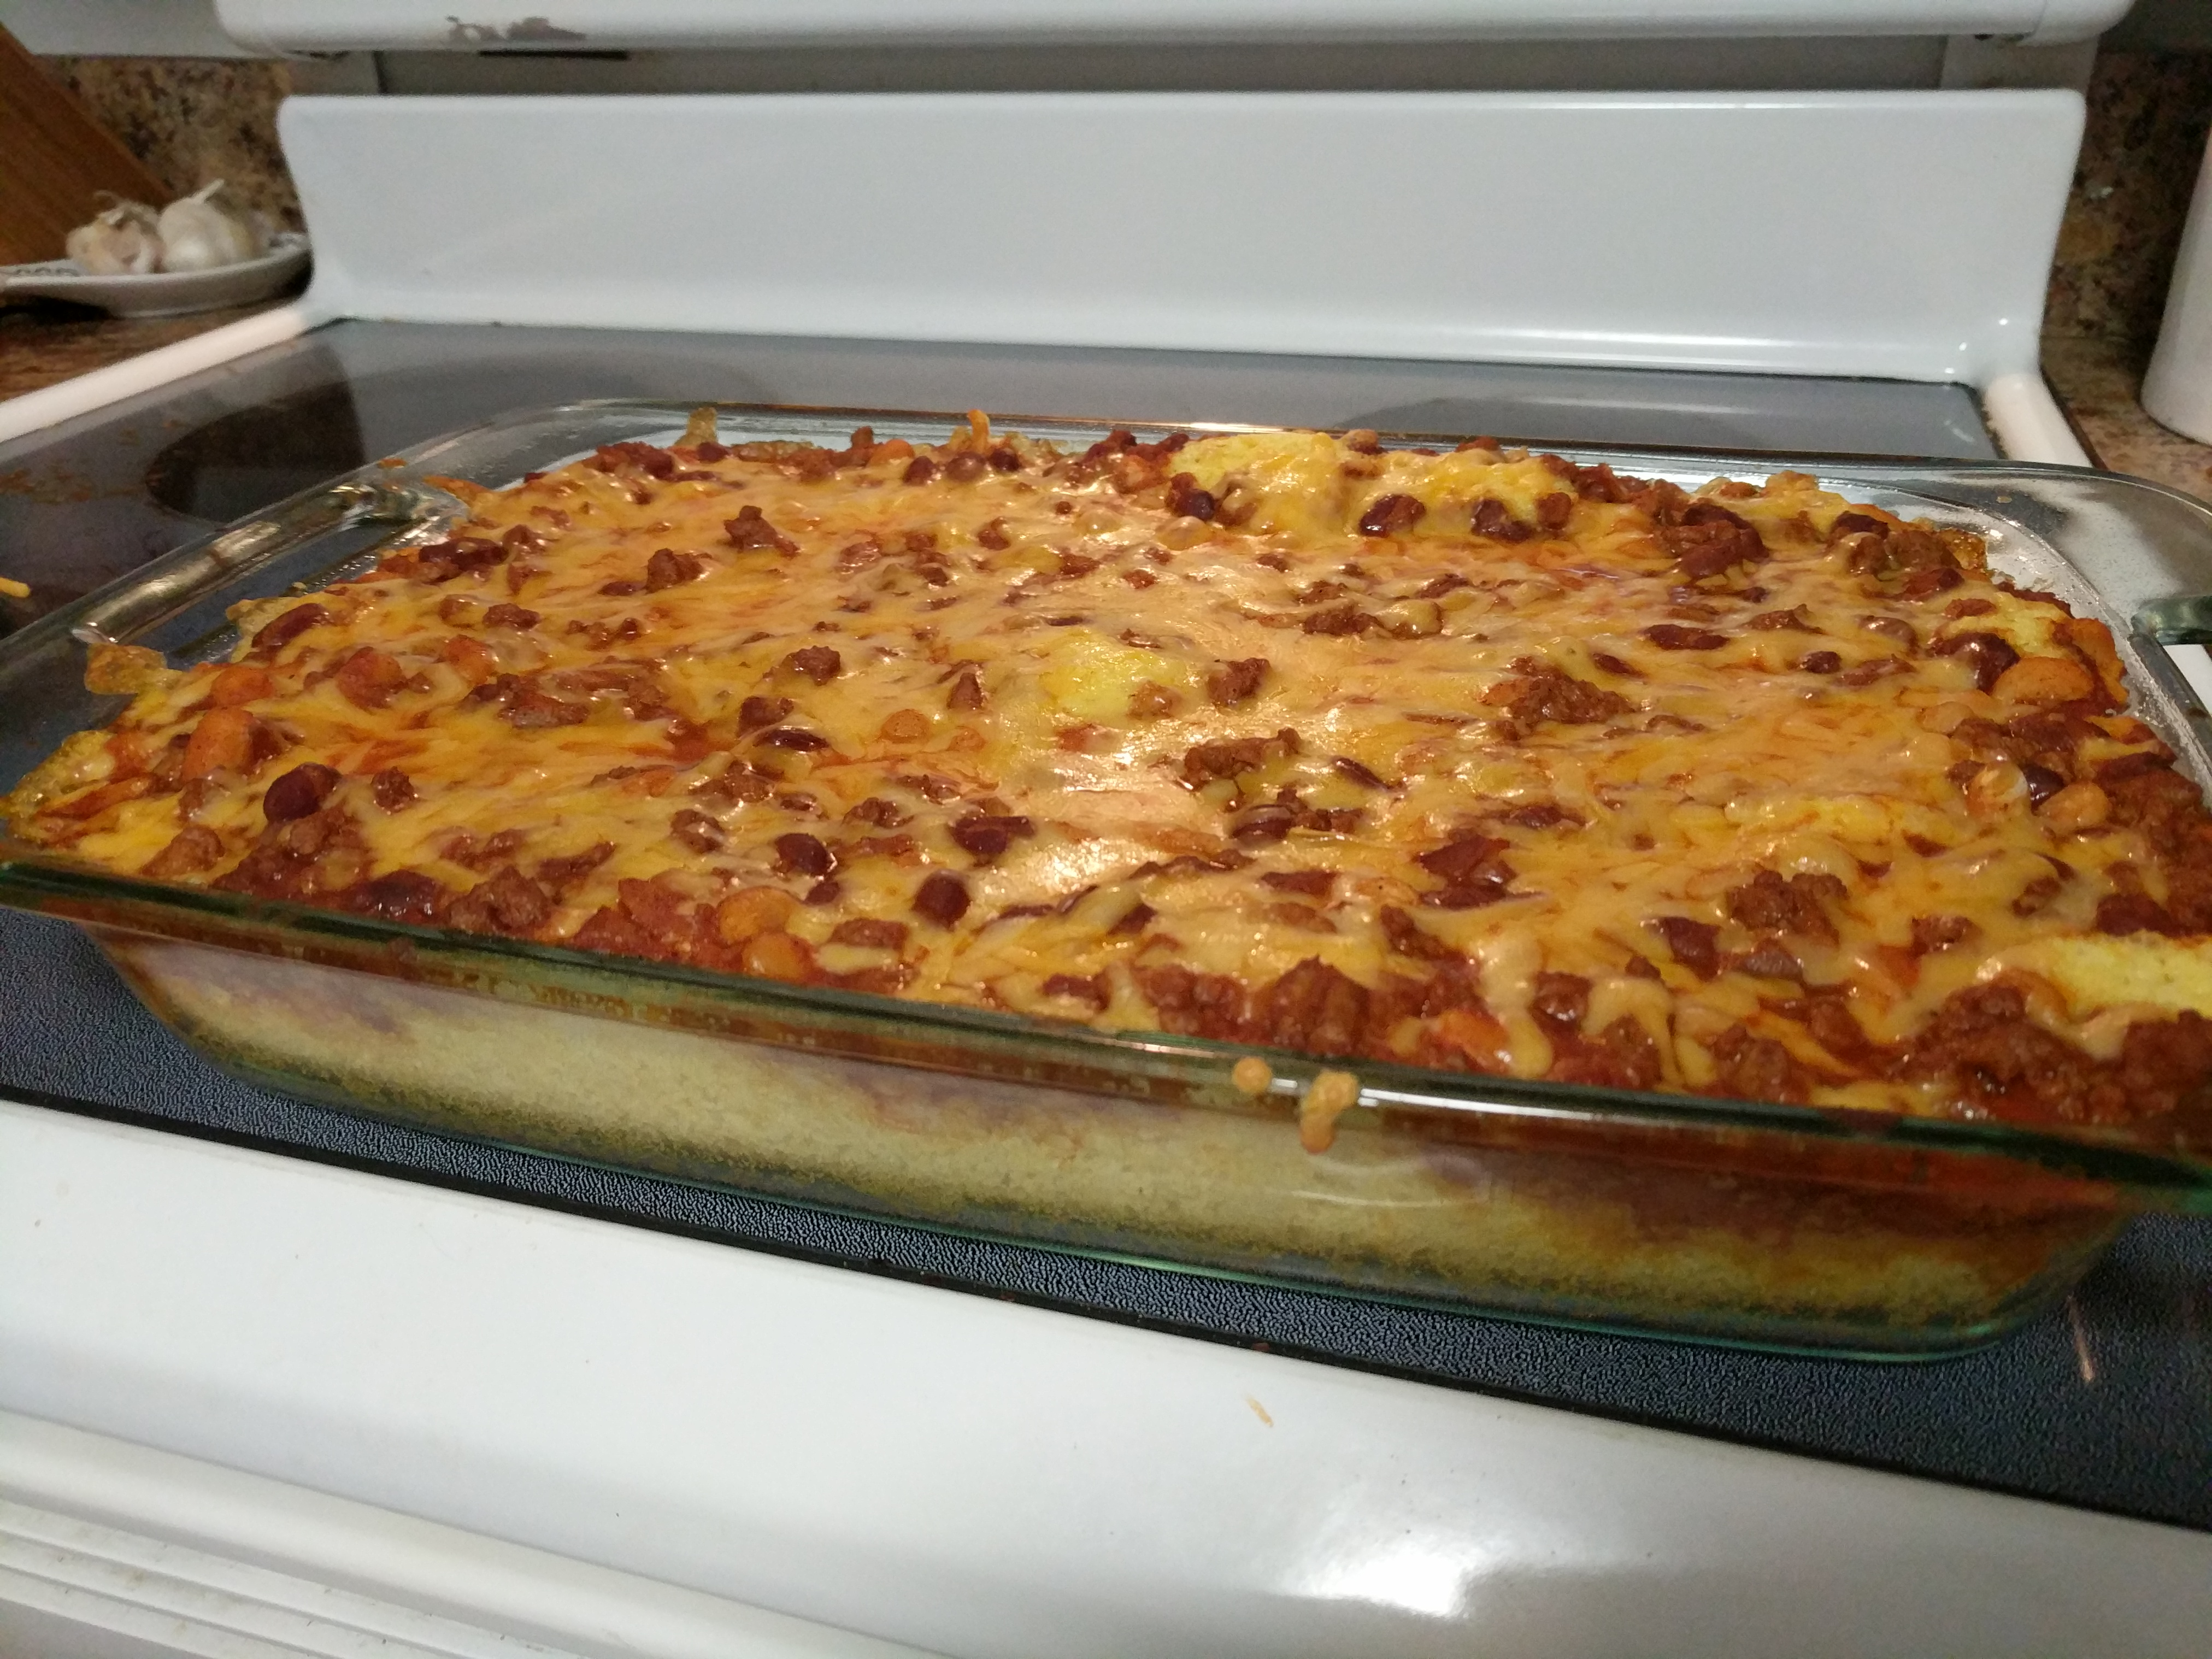 Easy Chili Cornbread Bake